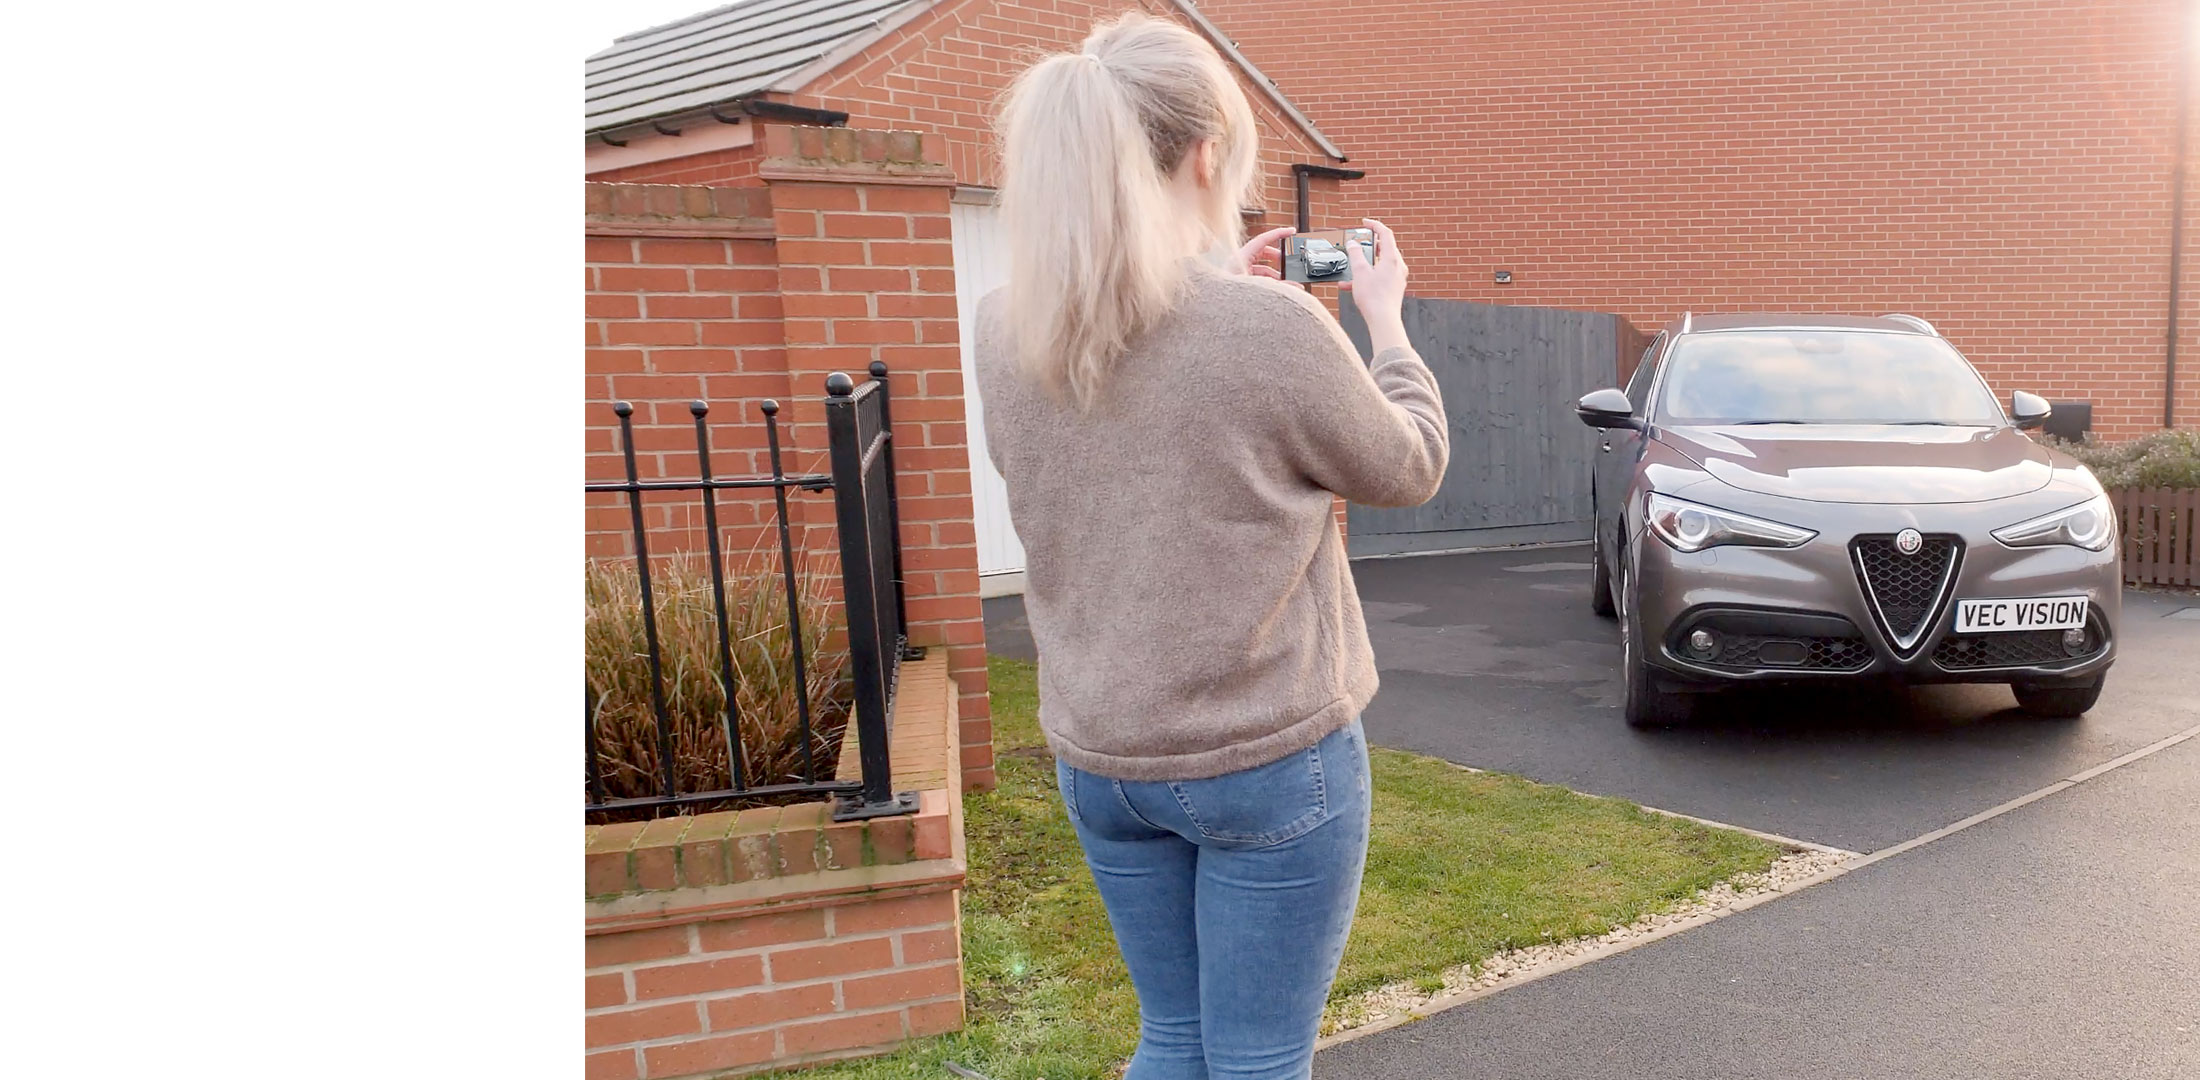 Vehicle Vision Assist - Appraisal video app